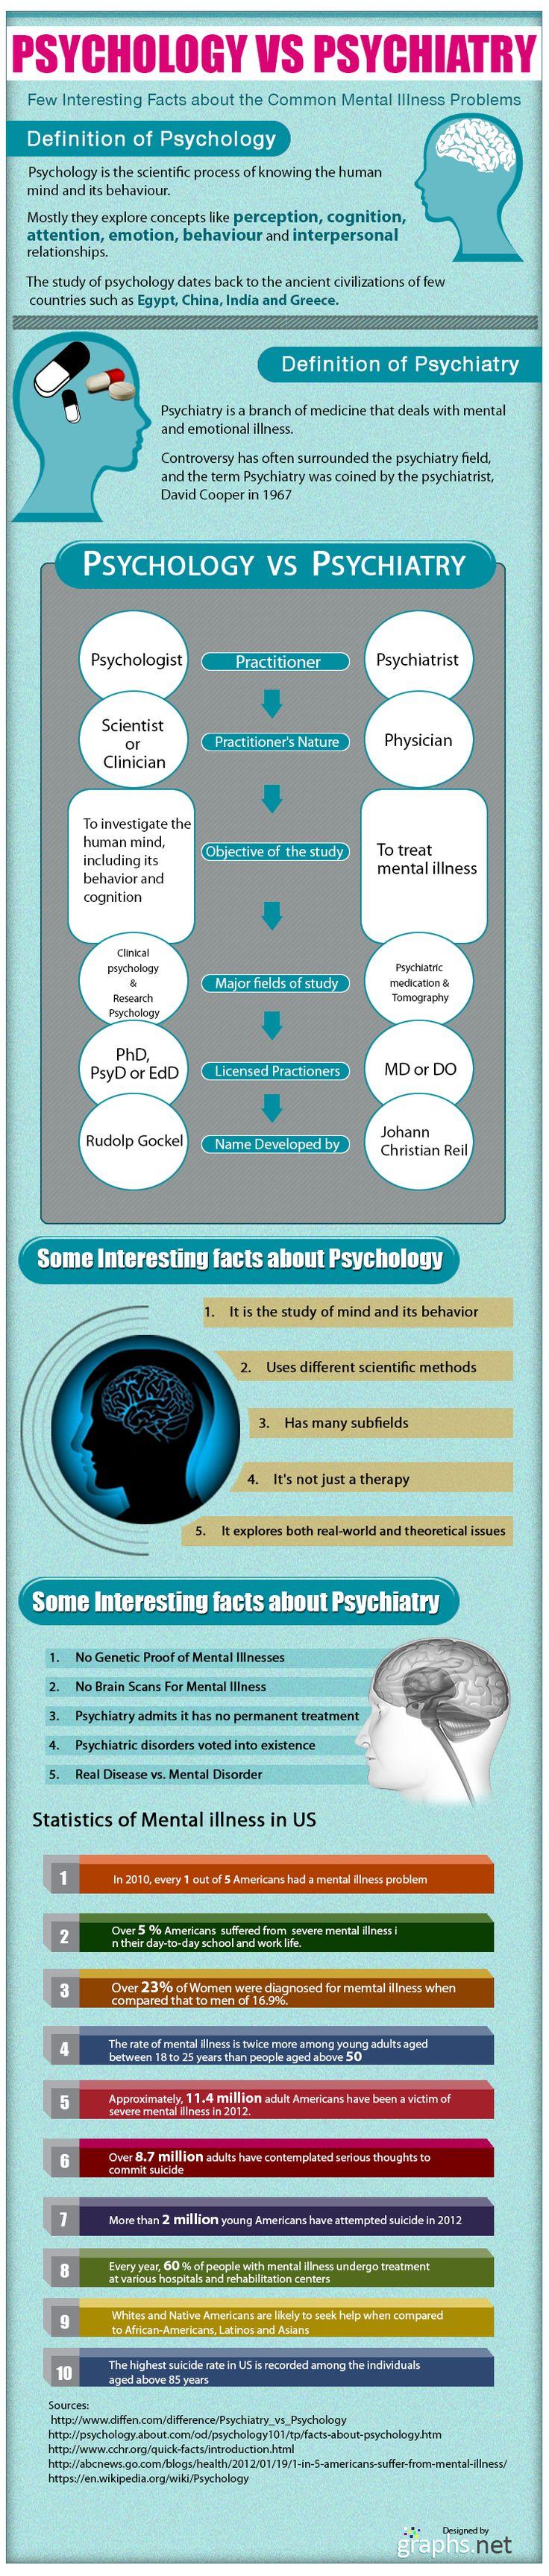 a career as a psychiatrist essay